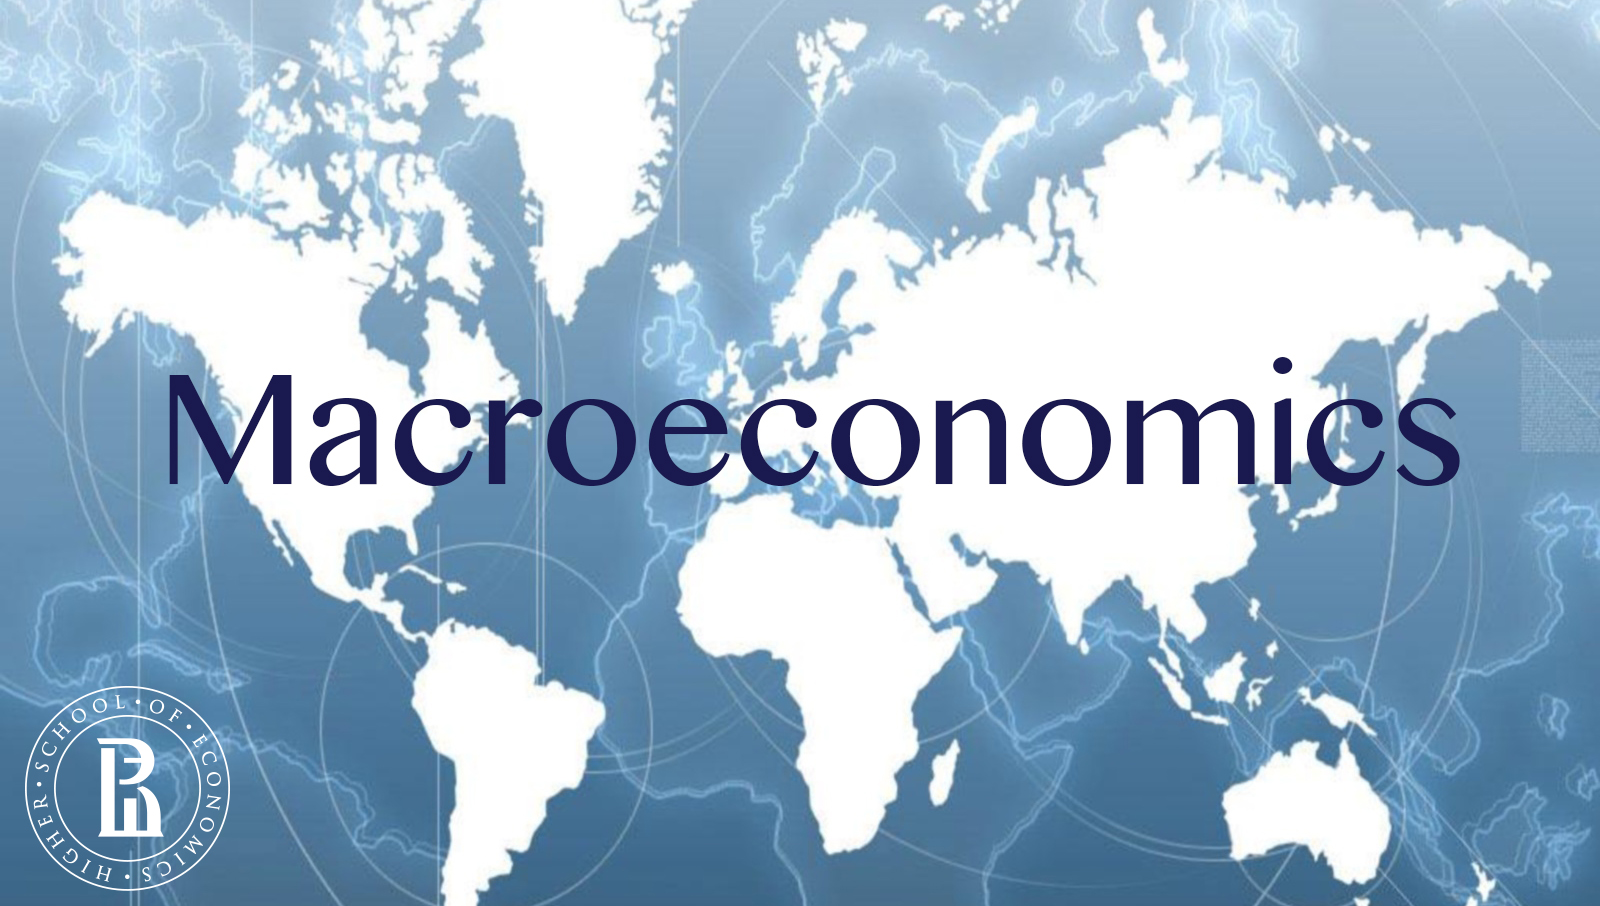 Макроэкономика (Macroeconomics) course image